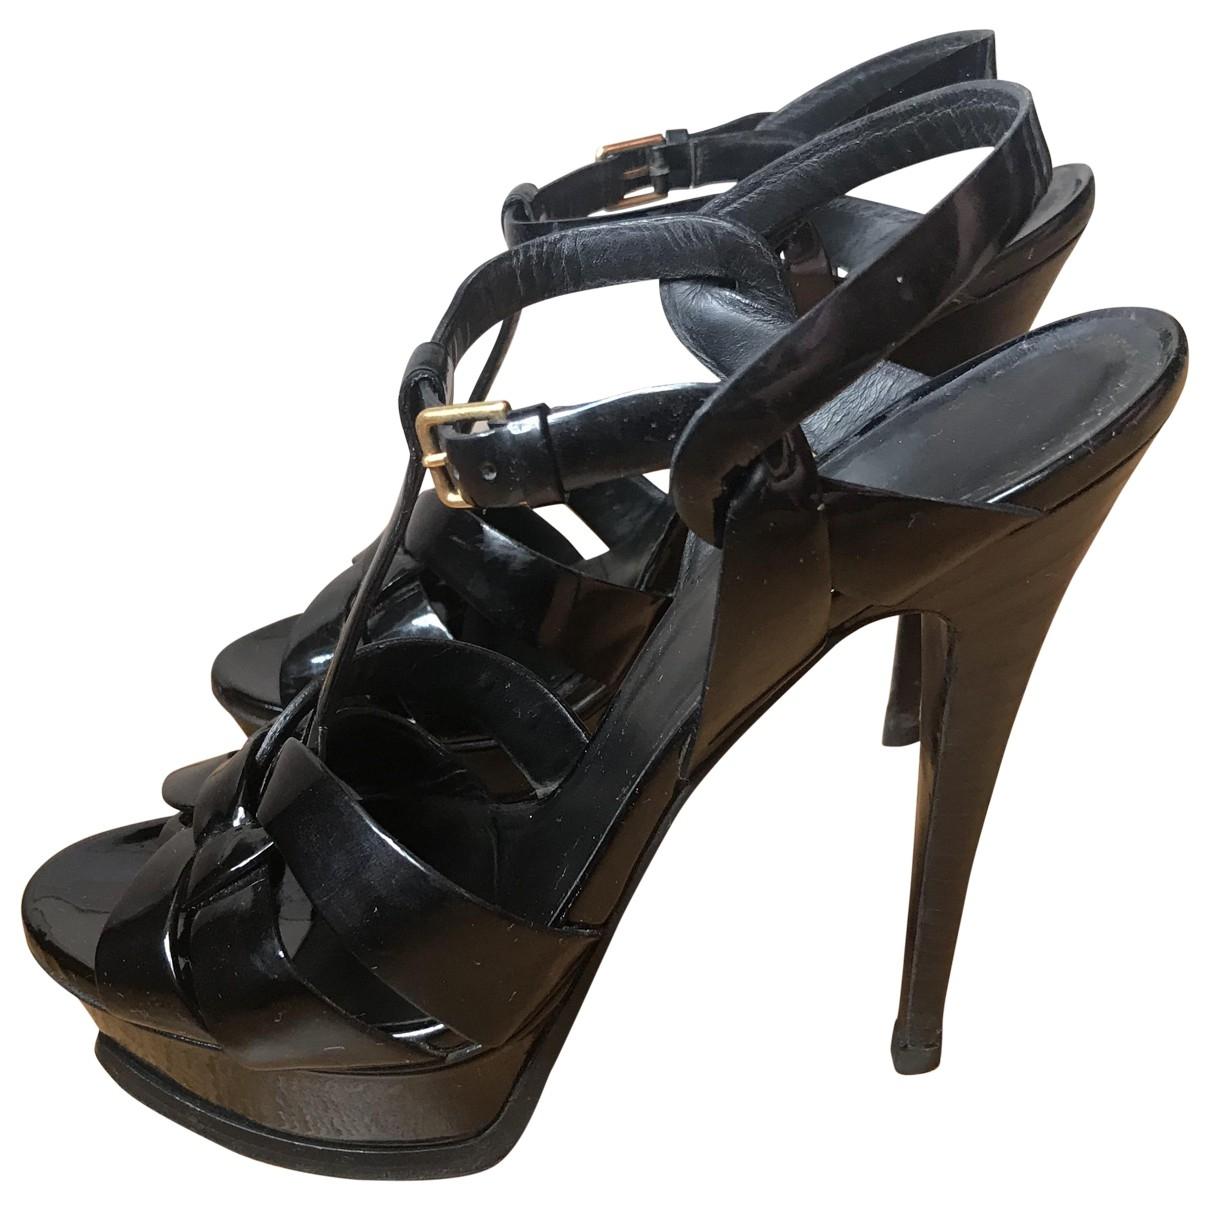 Yves Saint Laurent Tribute Black Patent leather Sandals for Women 39.5 EU